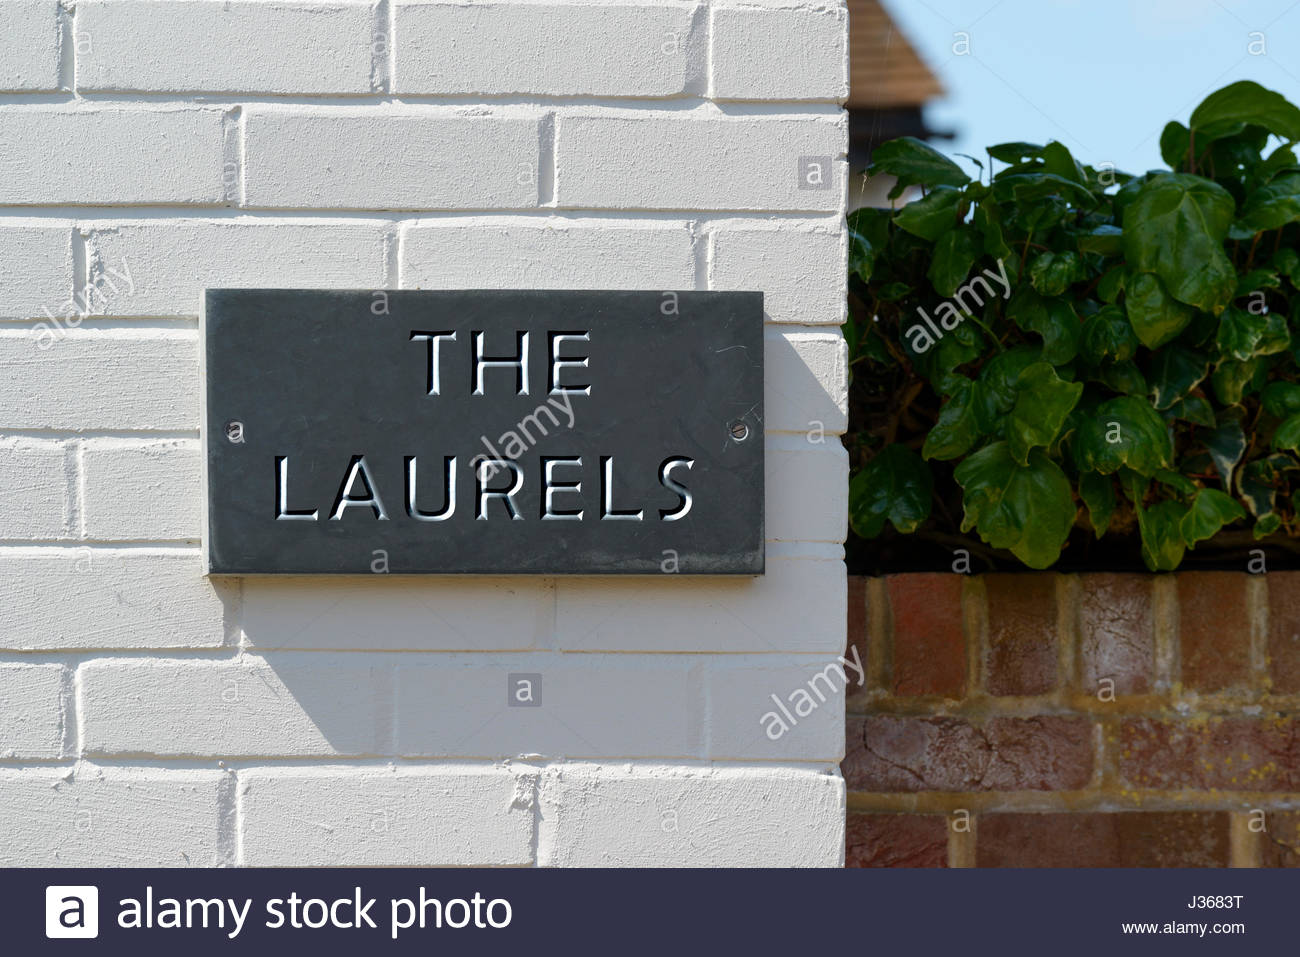 Laurels stock photos laurels stock images alamy for The laurel house